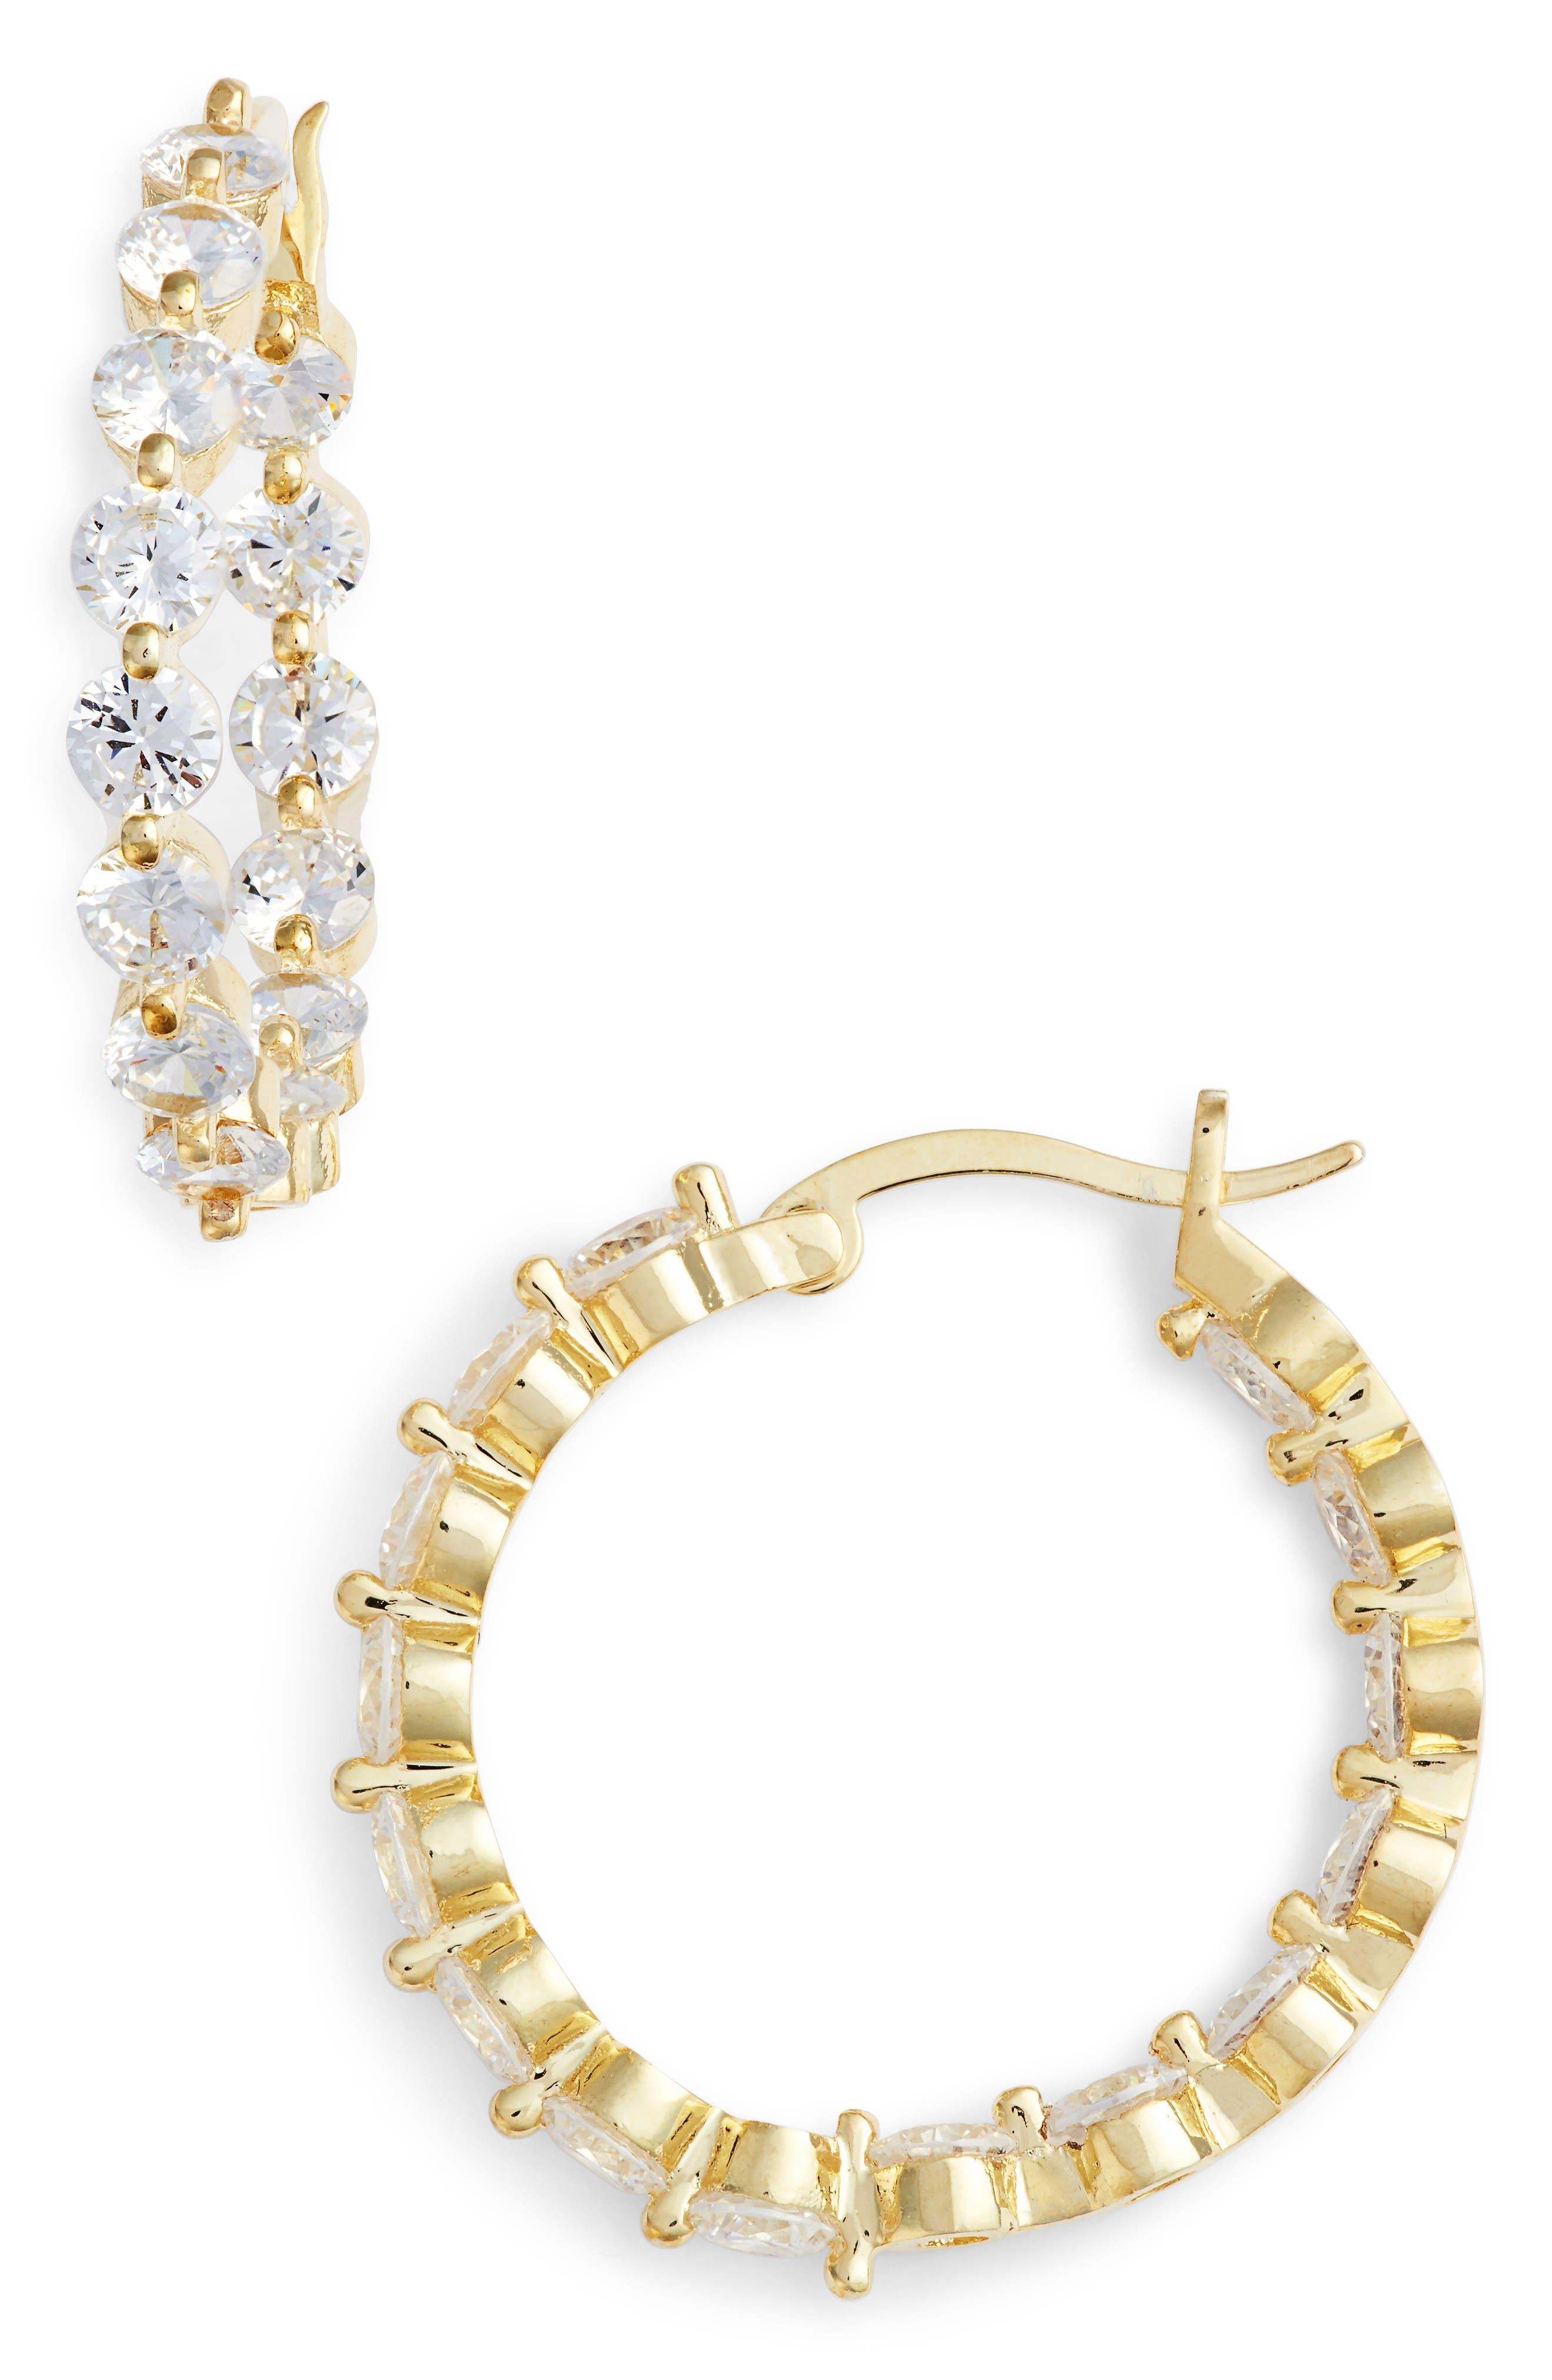 Medium Cubic Zirconia Hoop Earrings,                         Main,                         color, Gold/ White Cz